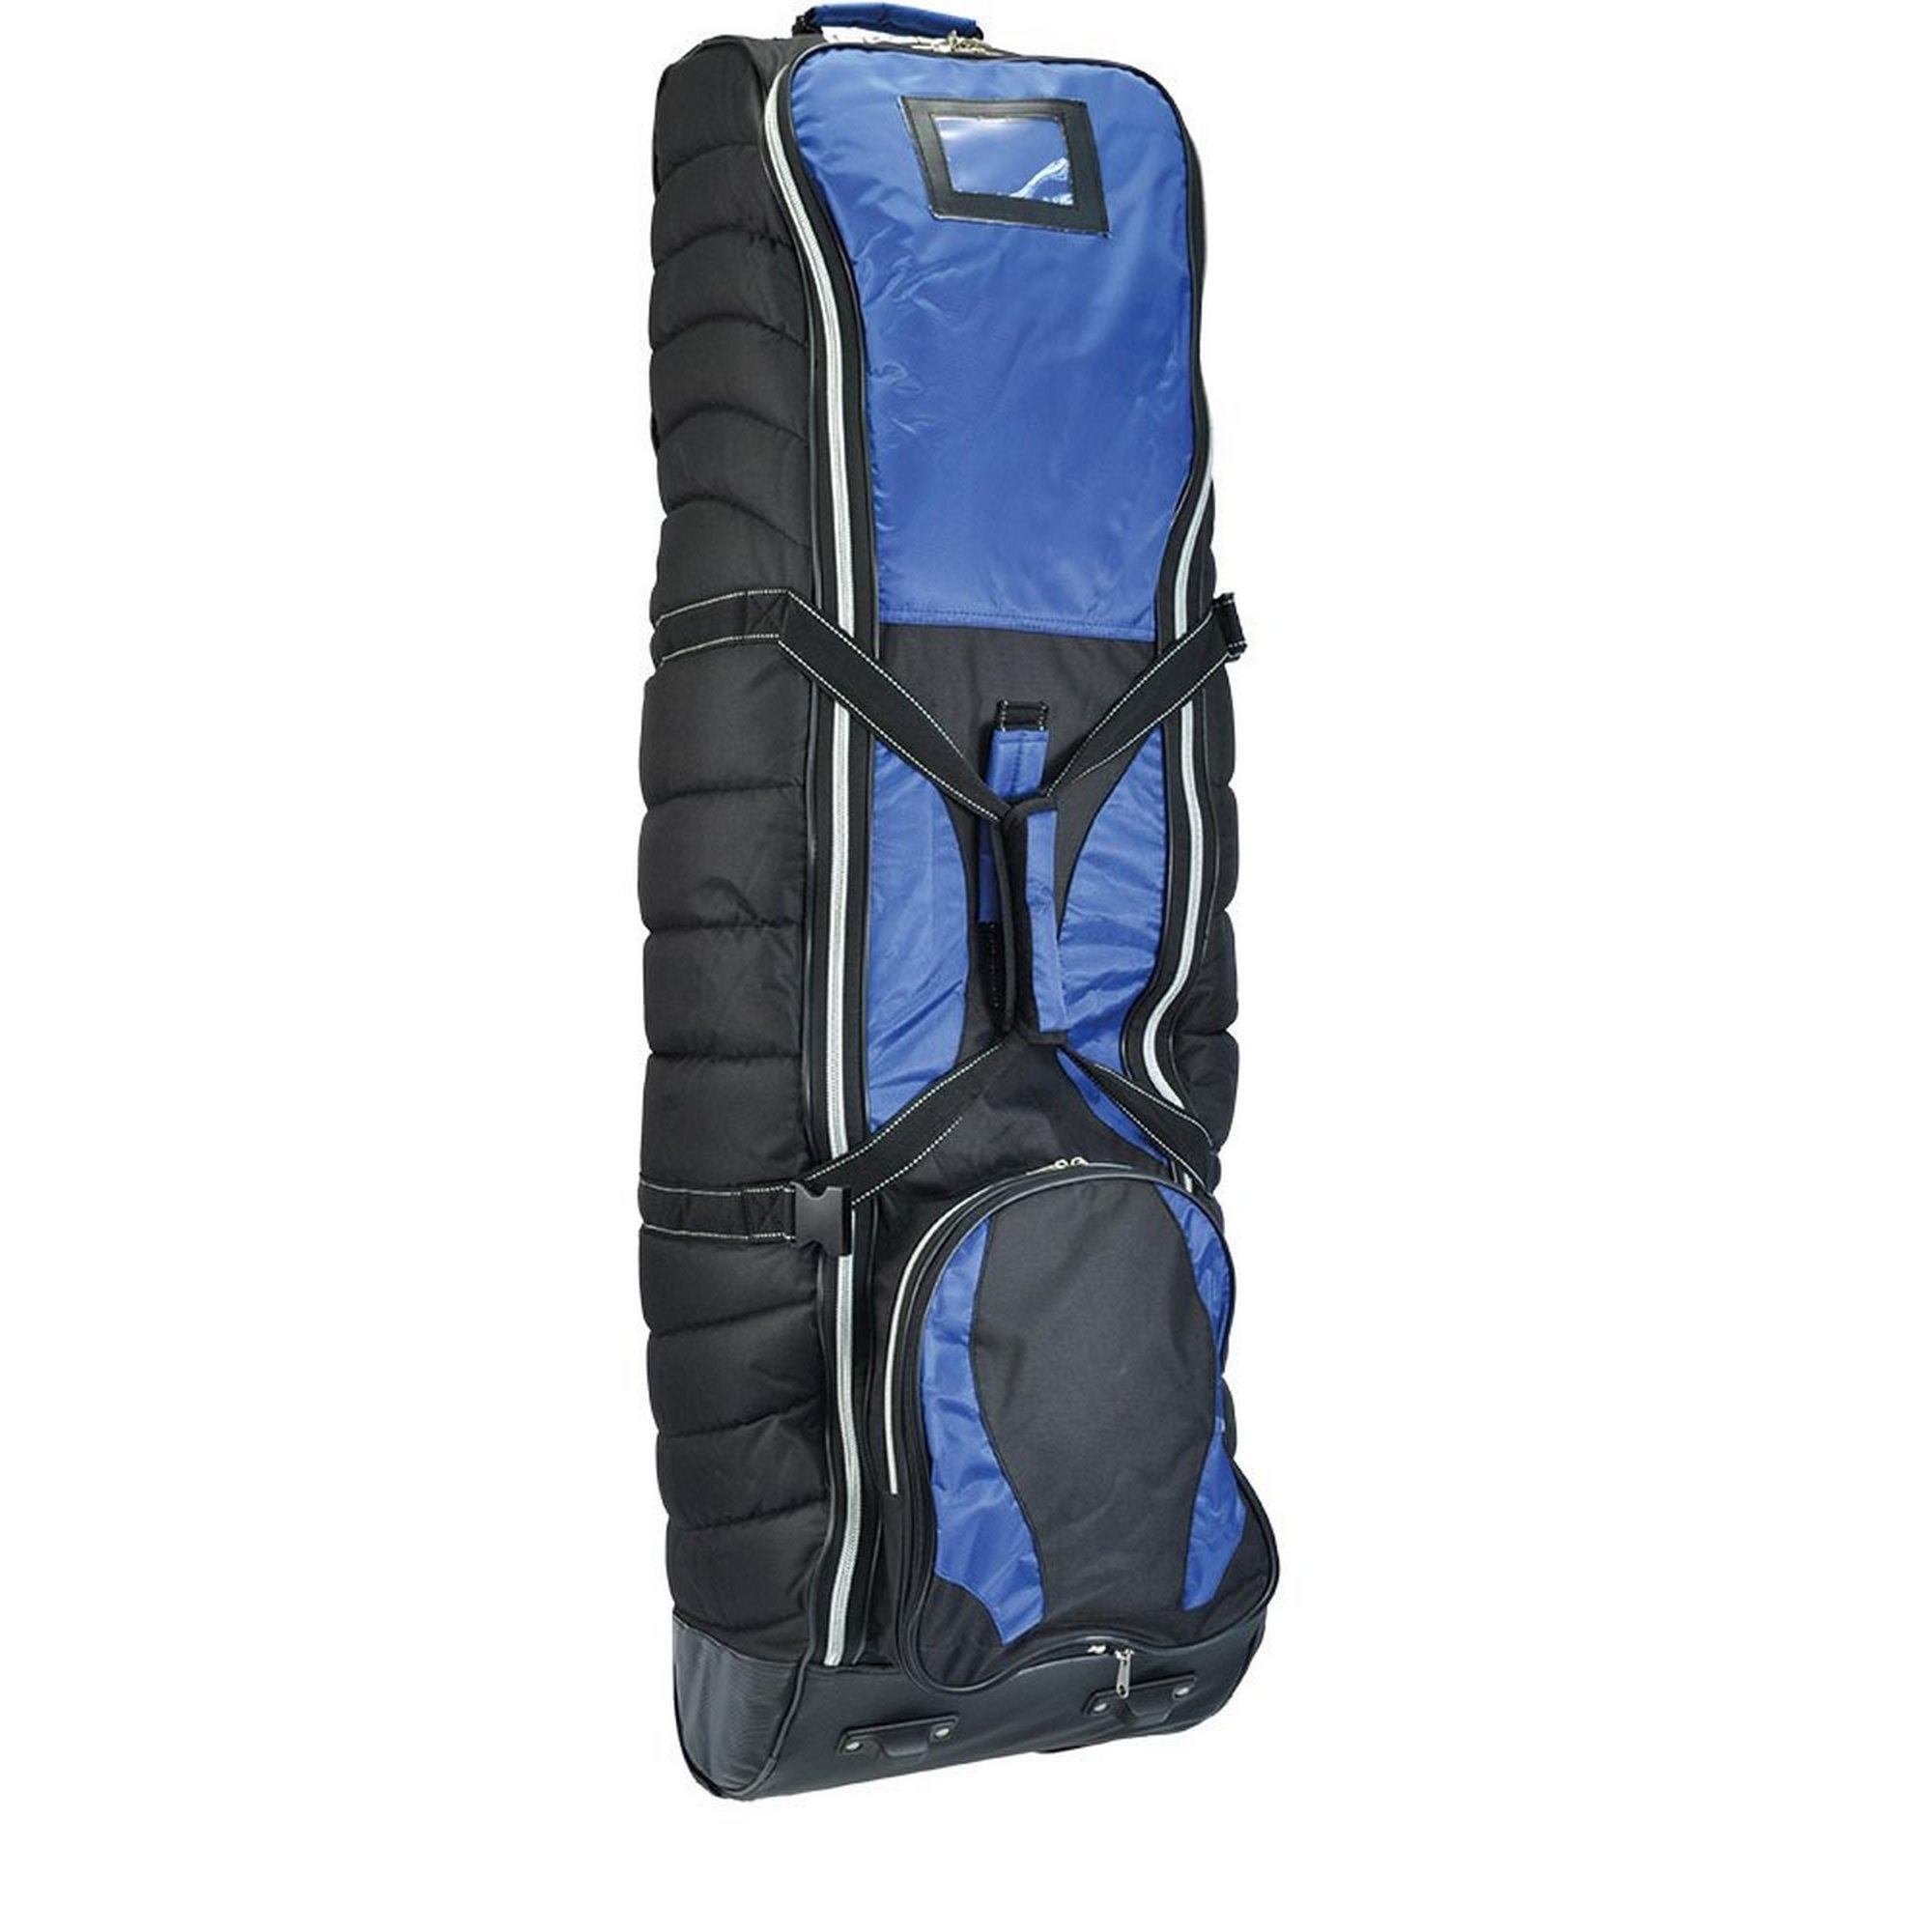 Image of Longridge Deluxe Roller Travel Golf Bag Cover